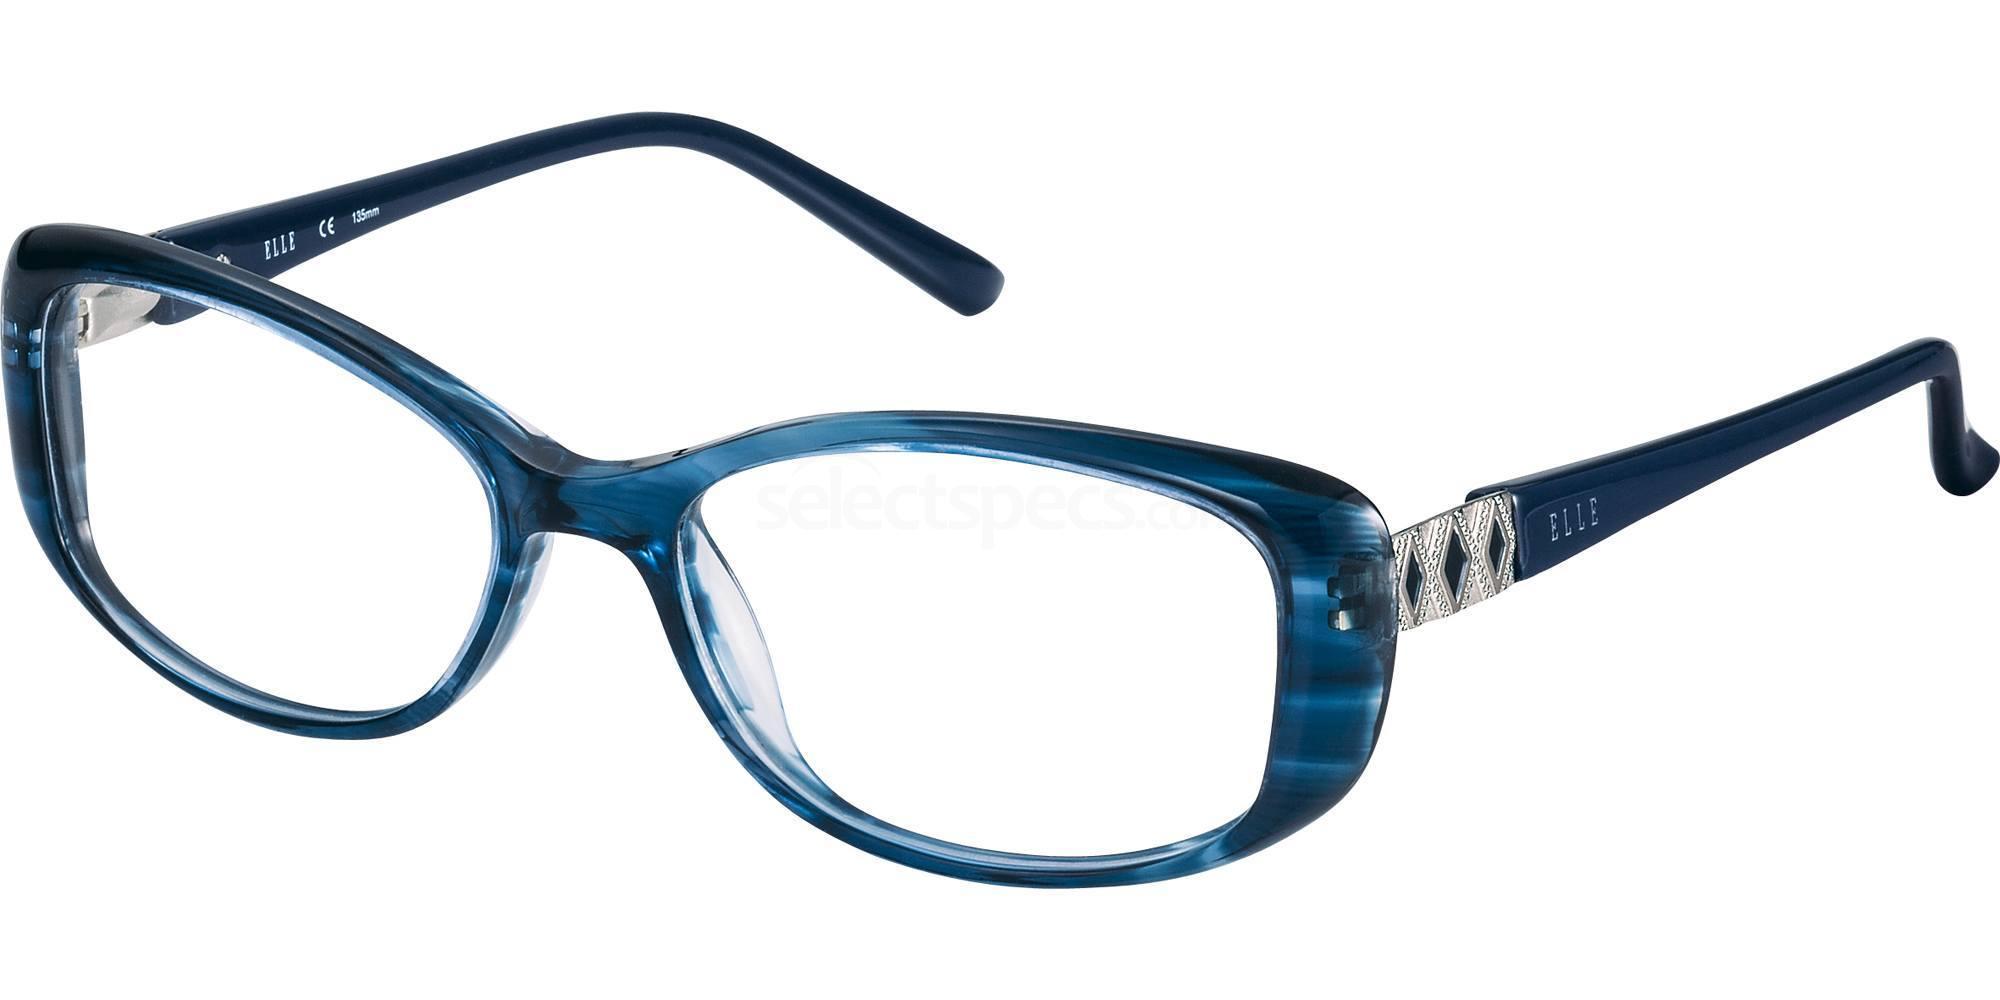 BL EL13385 Glasses, ELLE